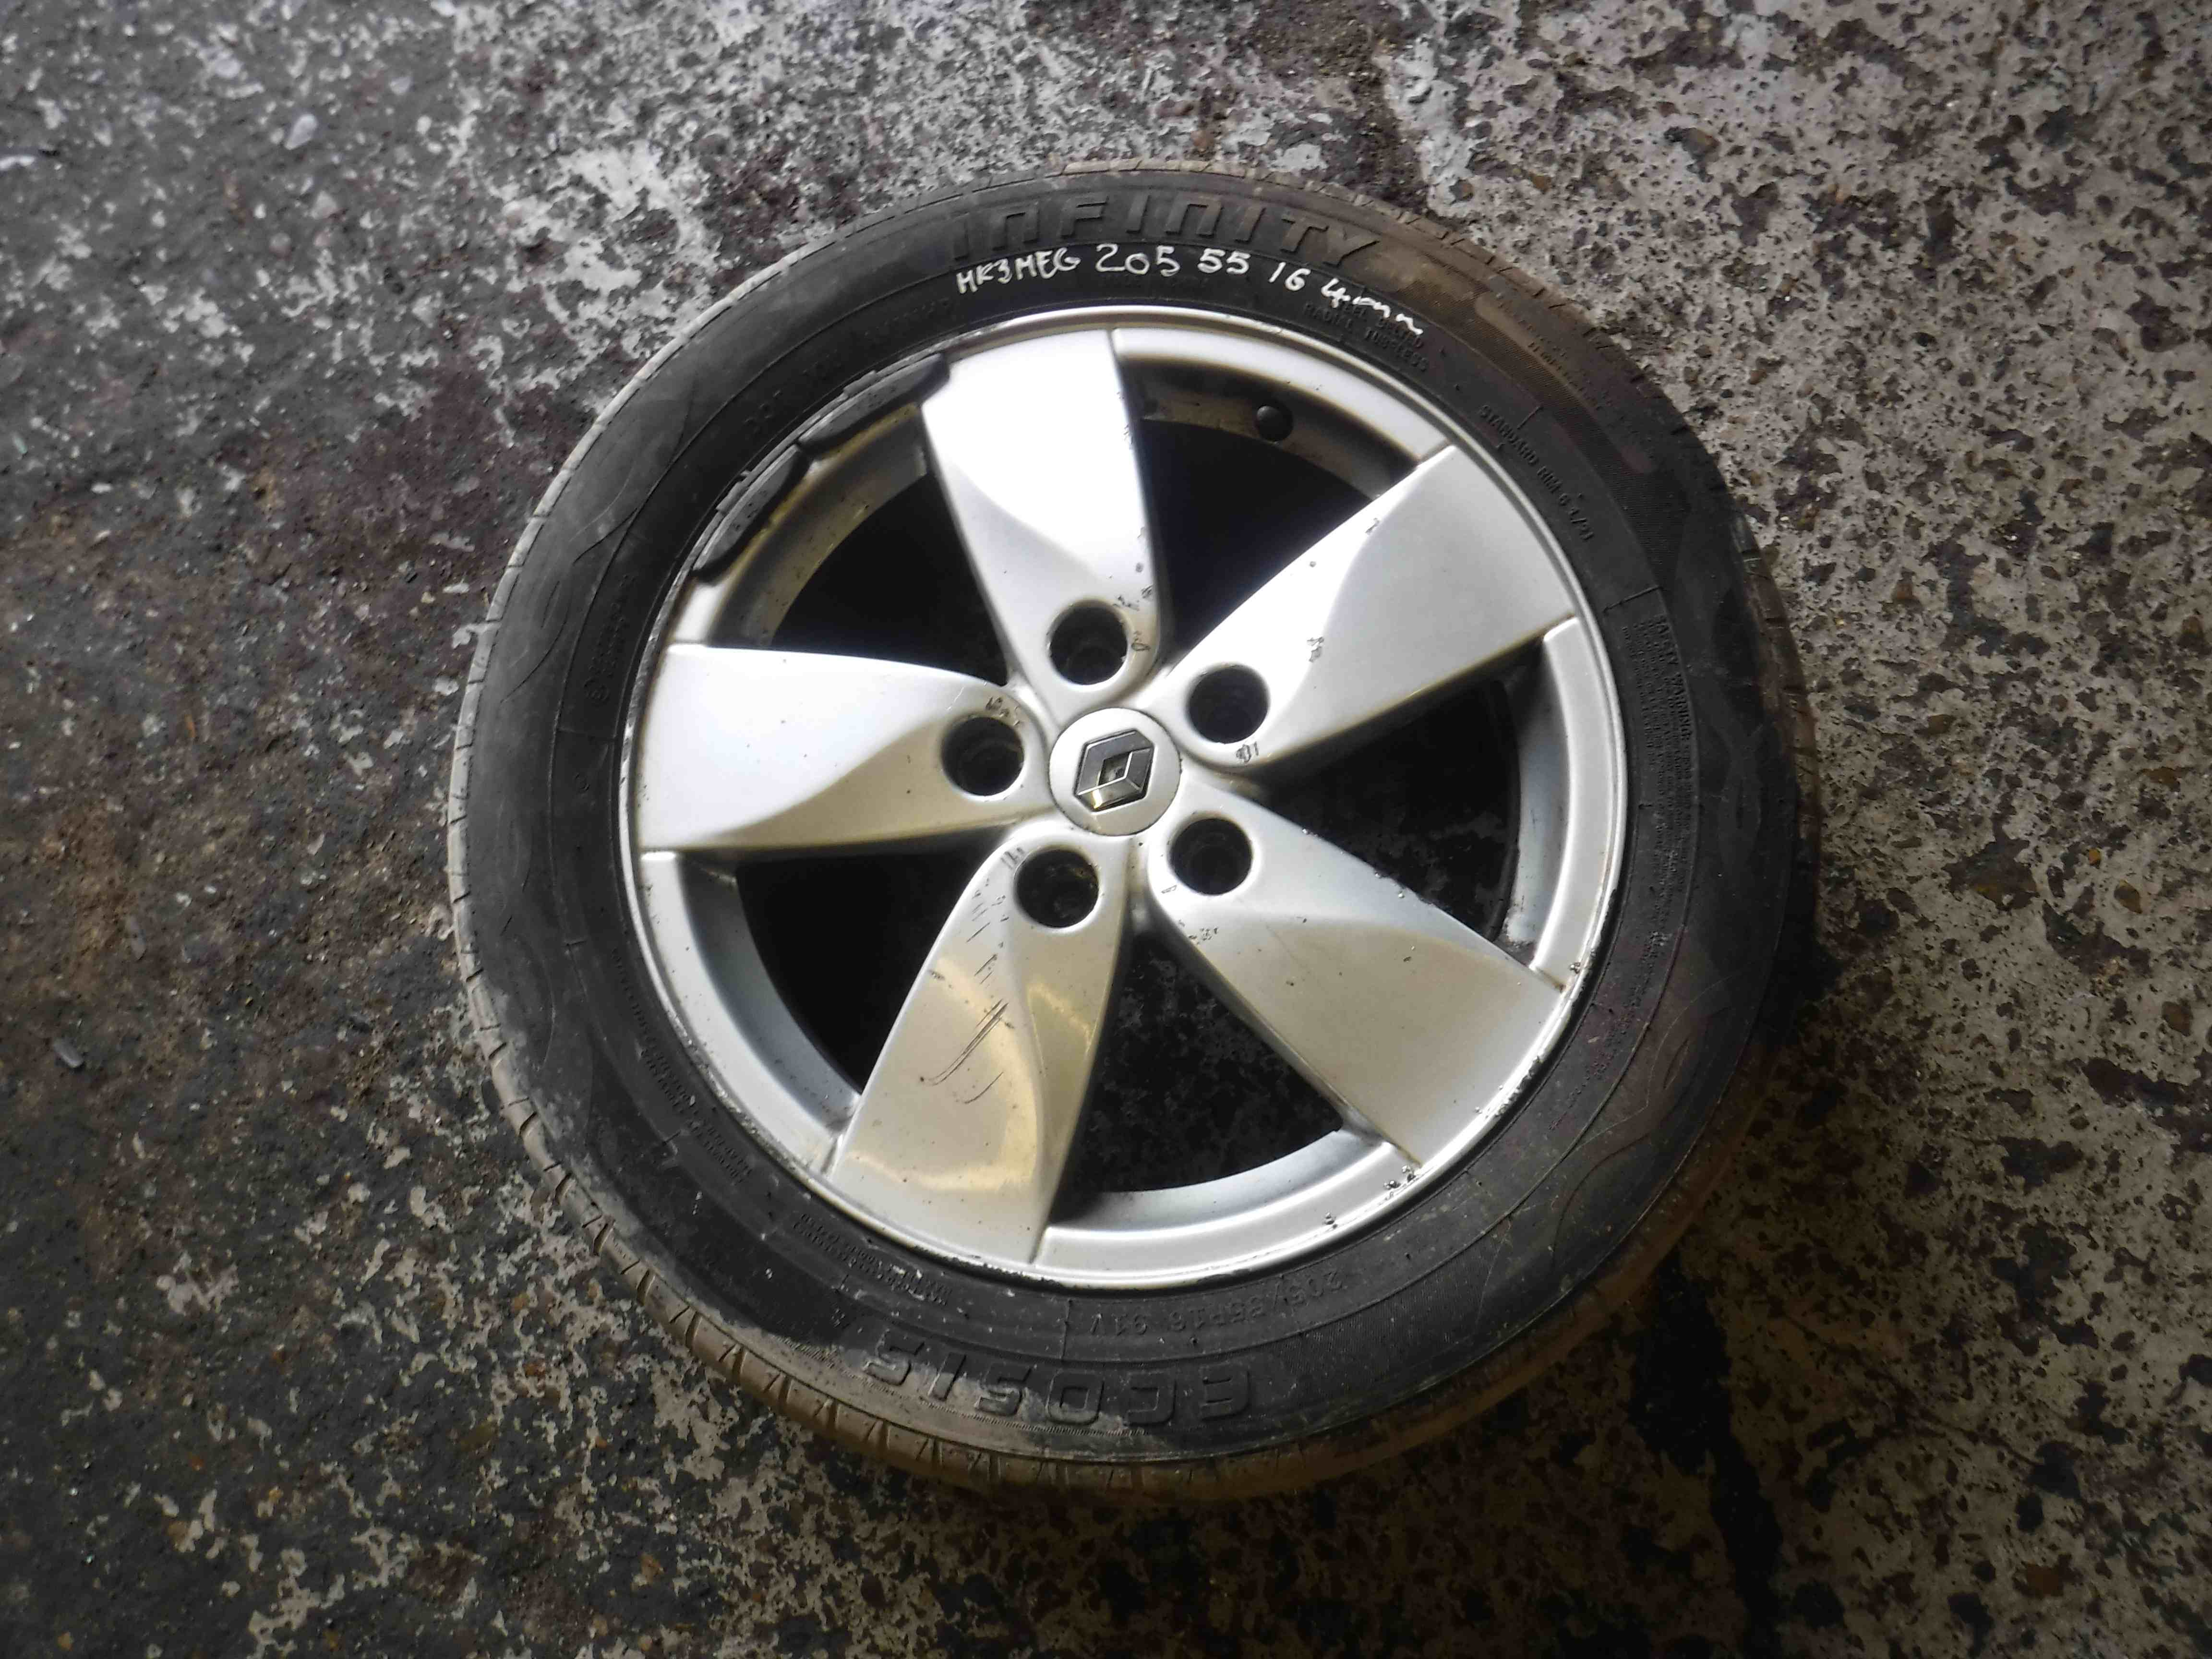 Renault Megane MK3 2008-2014 Proteus Alloy Wheel  Tyre 205 55 16inch 4mm  3.5 0